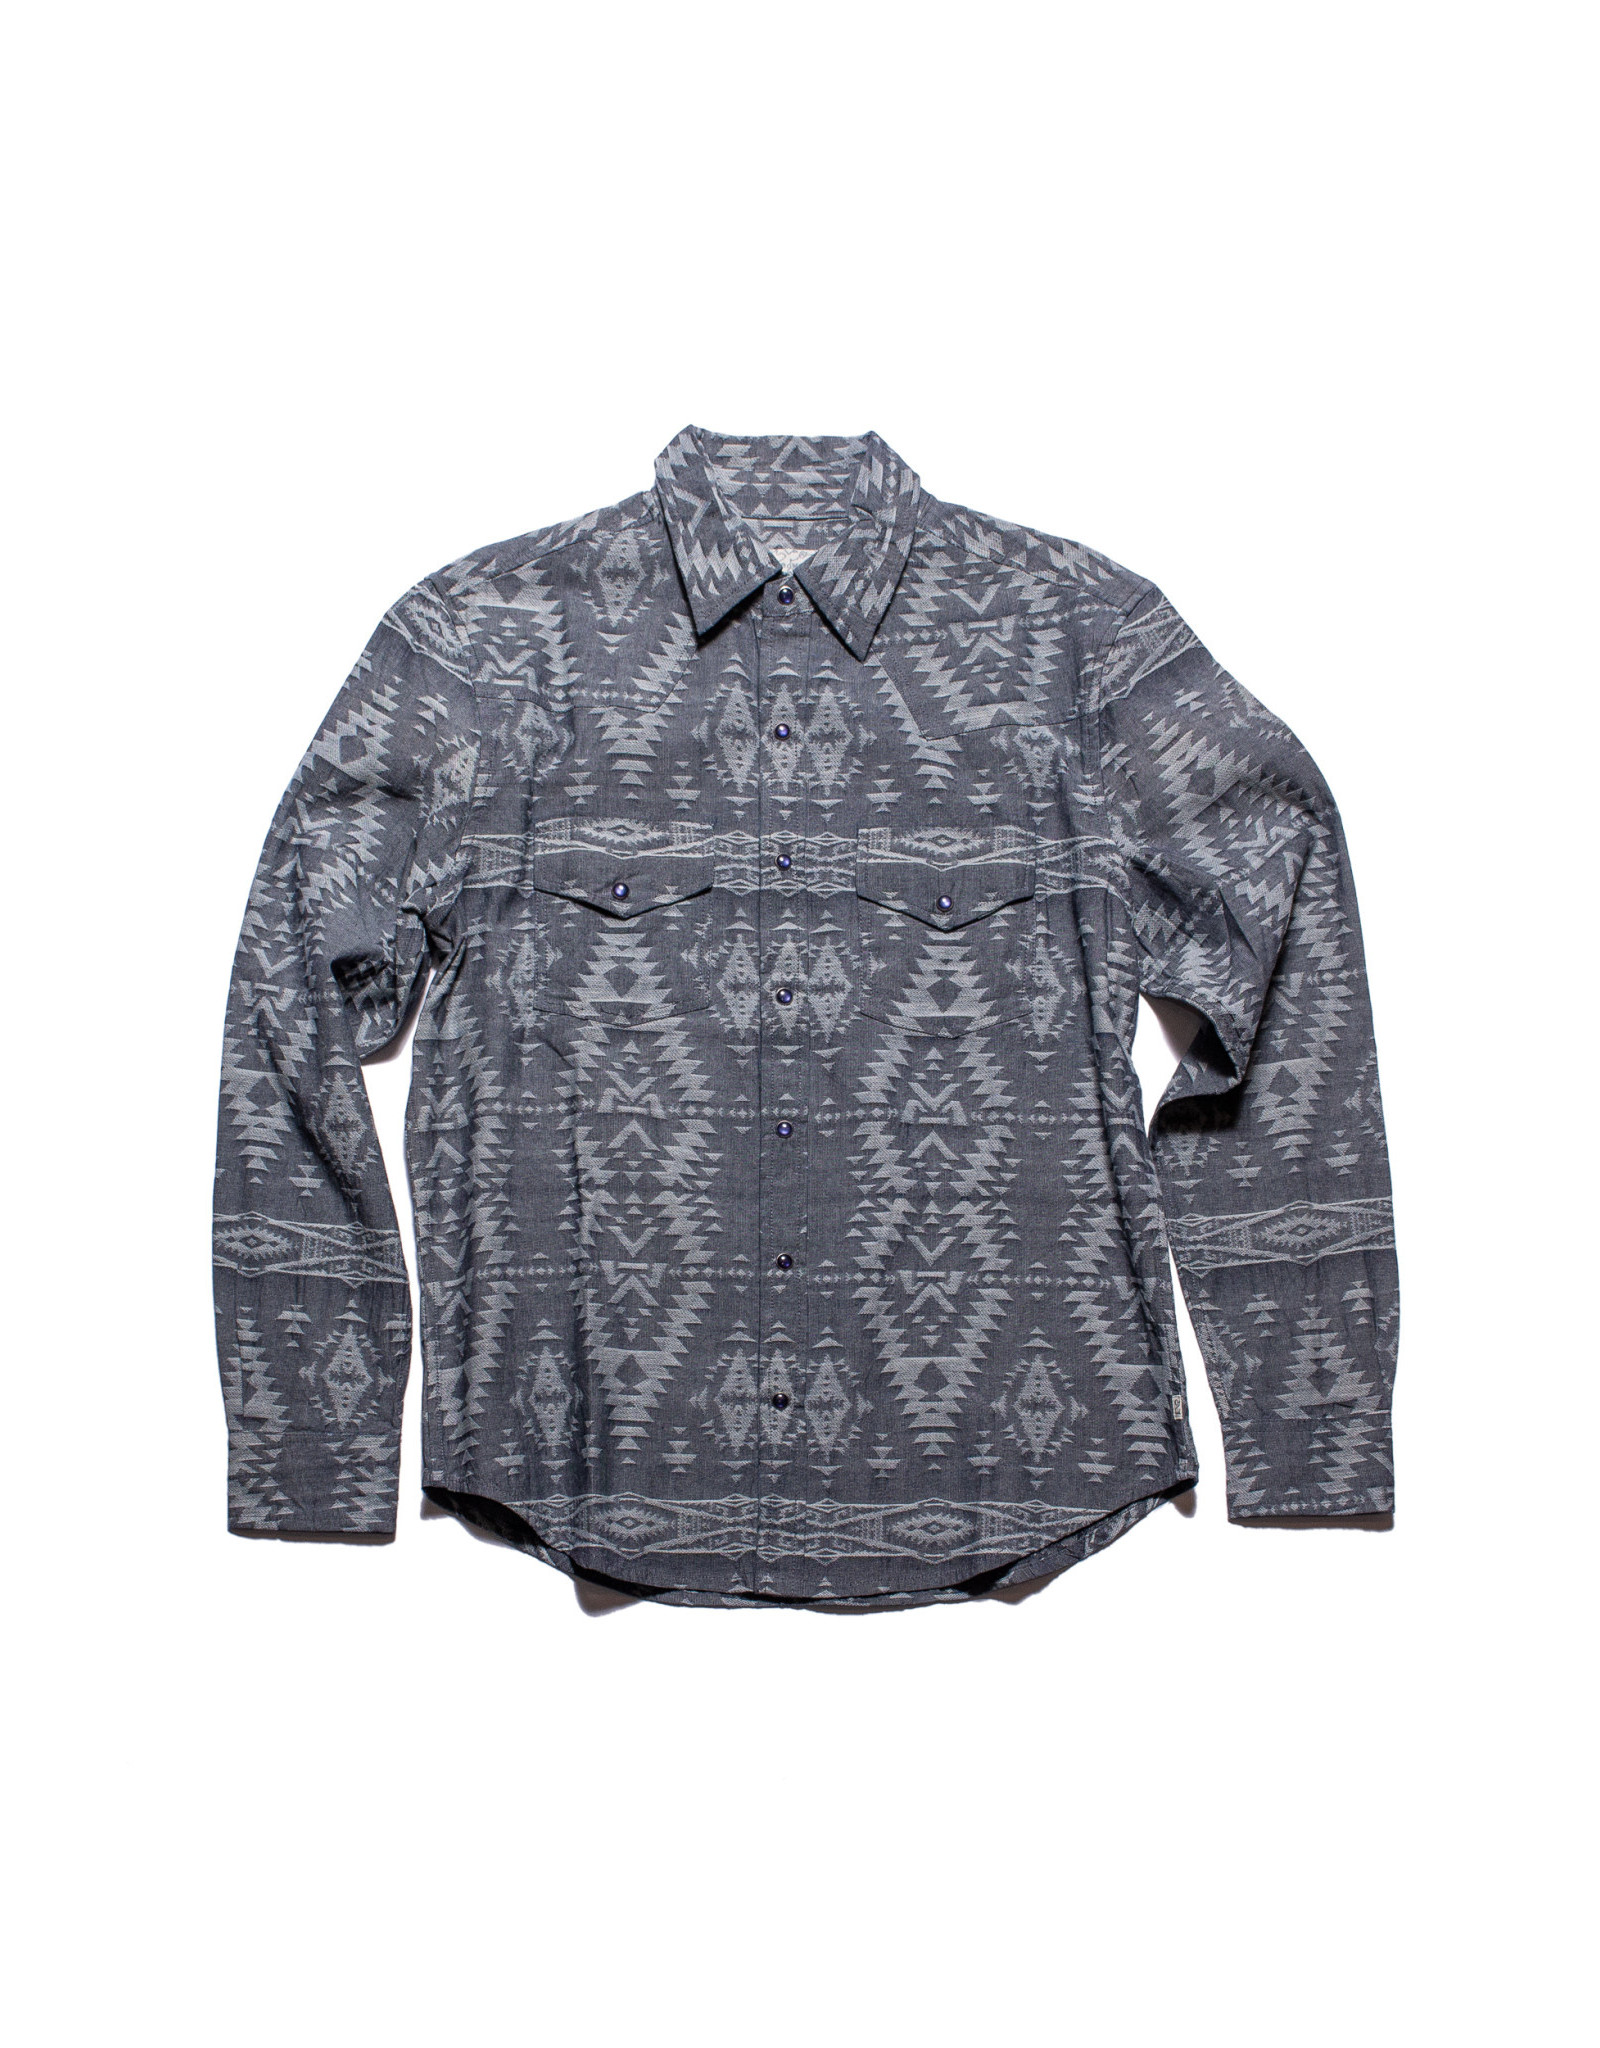 One World Brothers Jacquard Shirt